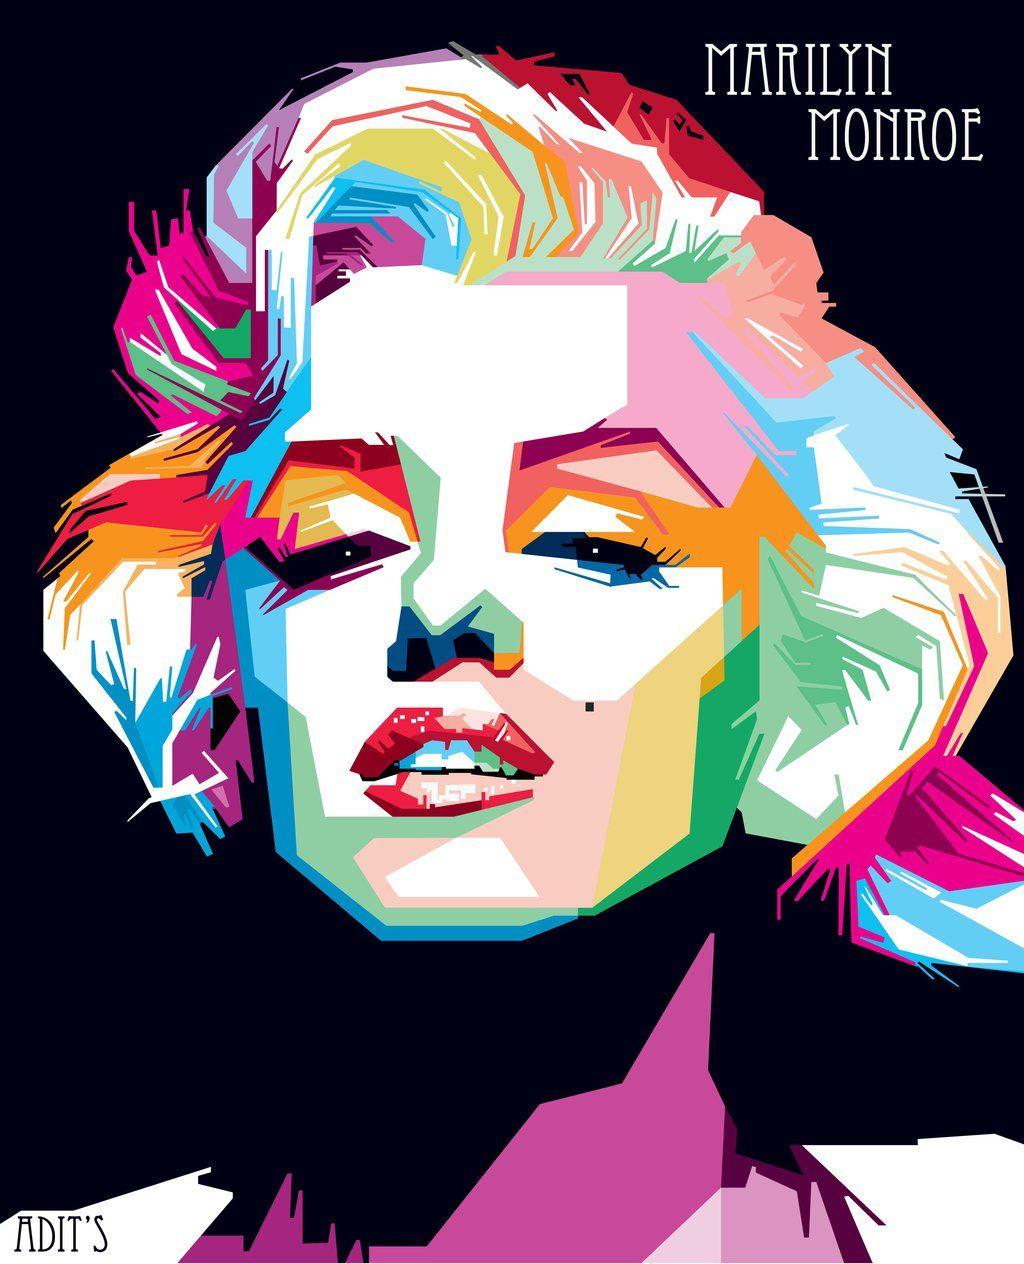 Monroe Wpap By Adityasp Deviantart Com On Deviantart Marilyn Monroe Pop Art Wpap Art Pop Art Portraits